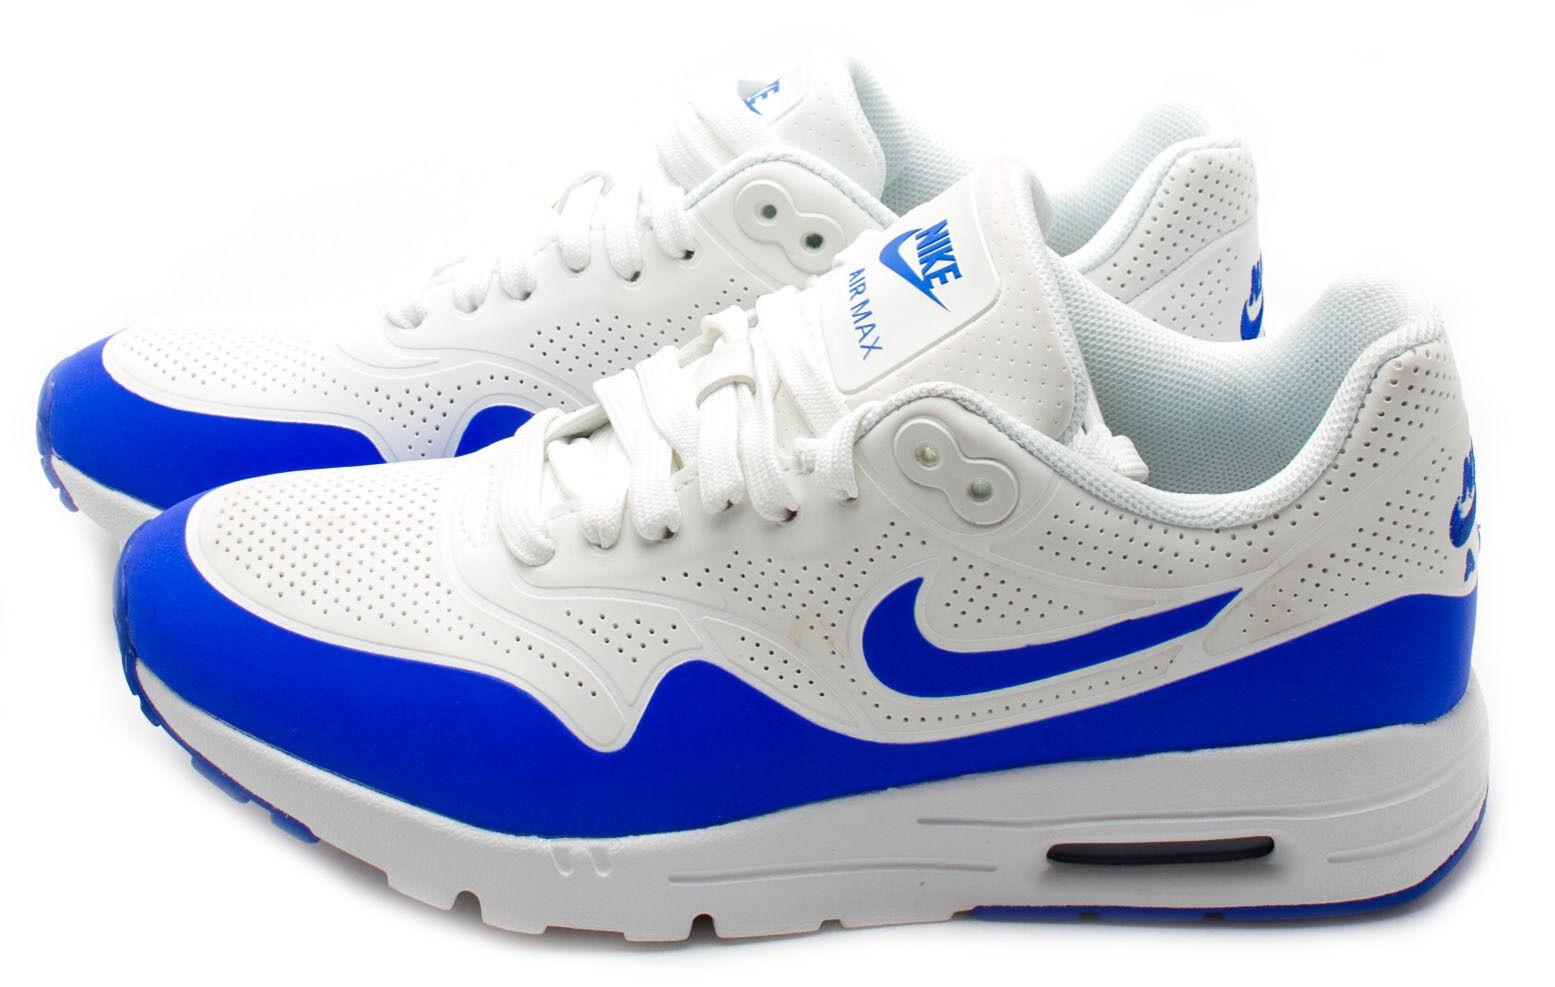 Nike Wouomo Air Max 1 Ultra Moire Running scarpe 704995-100 bianca blu sz.5.5-8.5